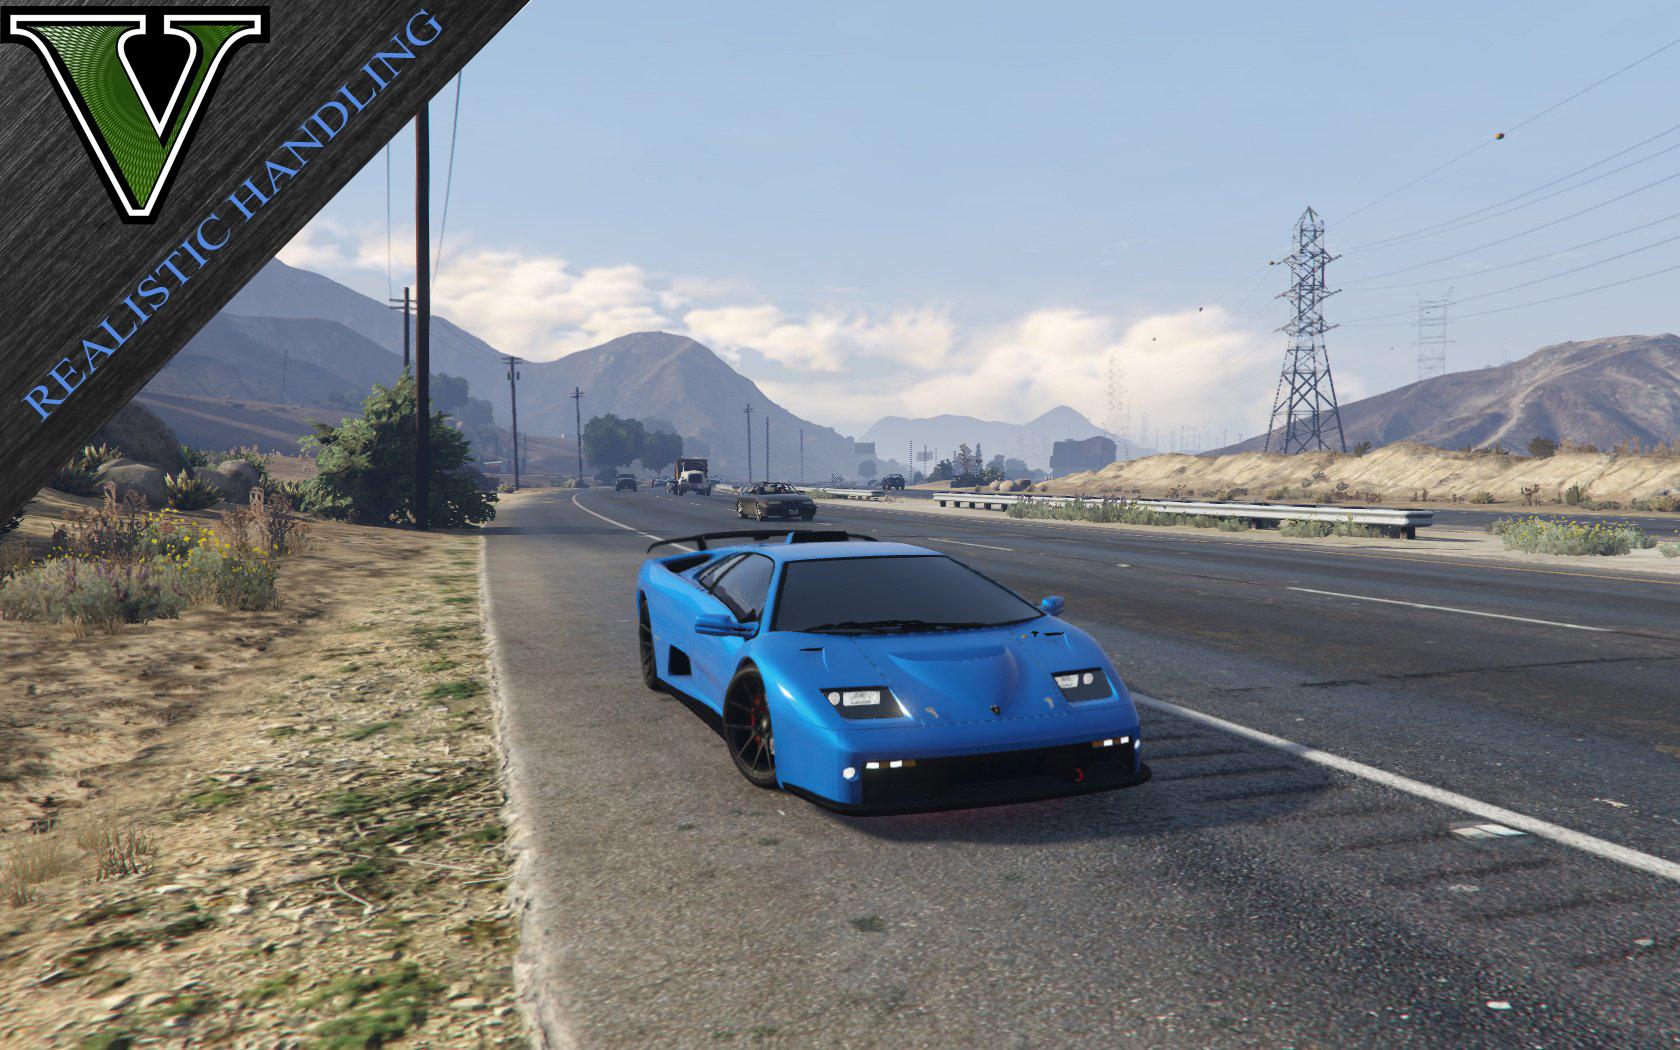 Realistic Handling Engine Sound Swap For Lamborghini Diablo Gtr